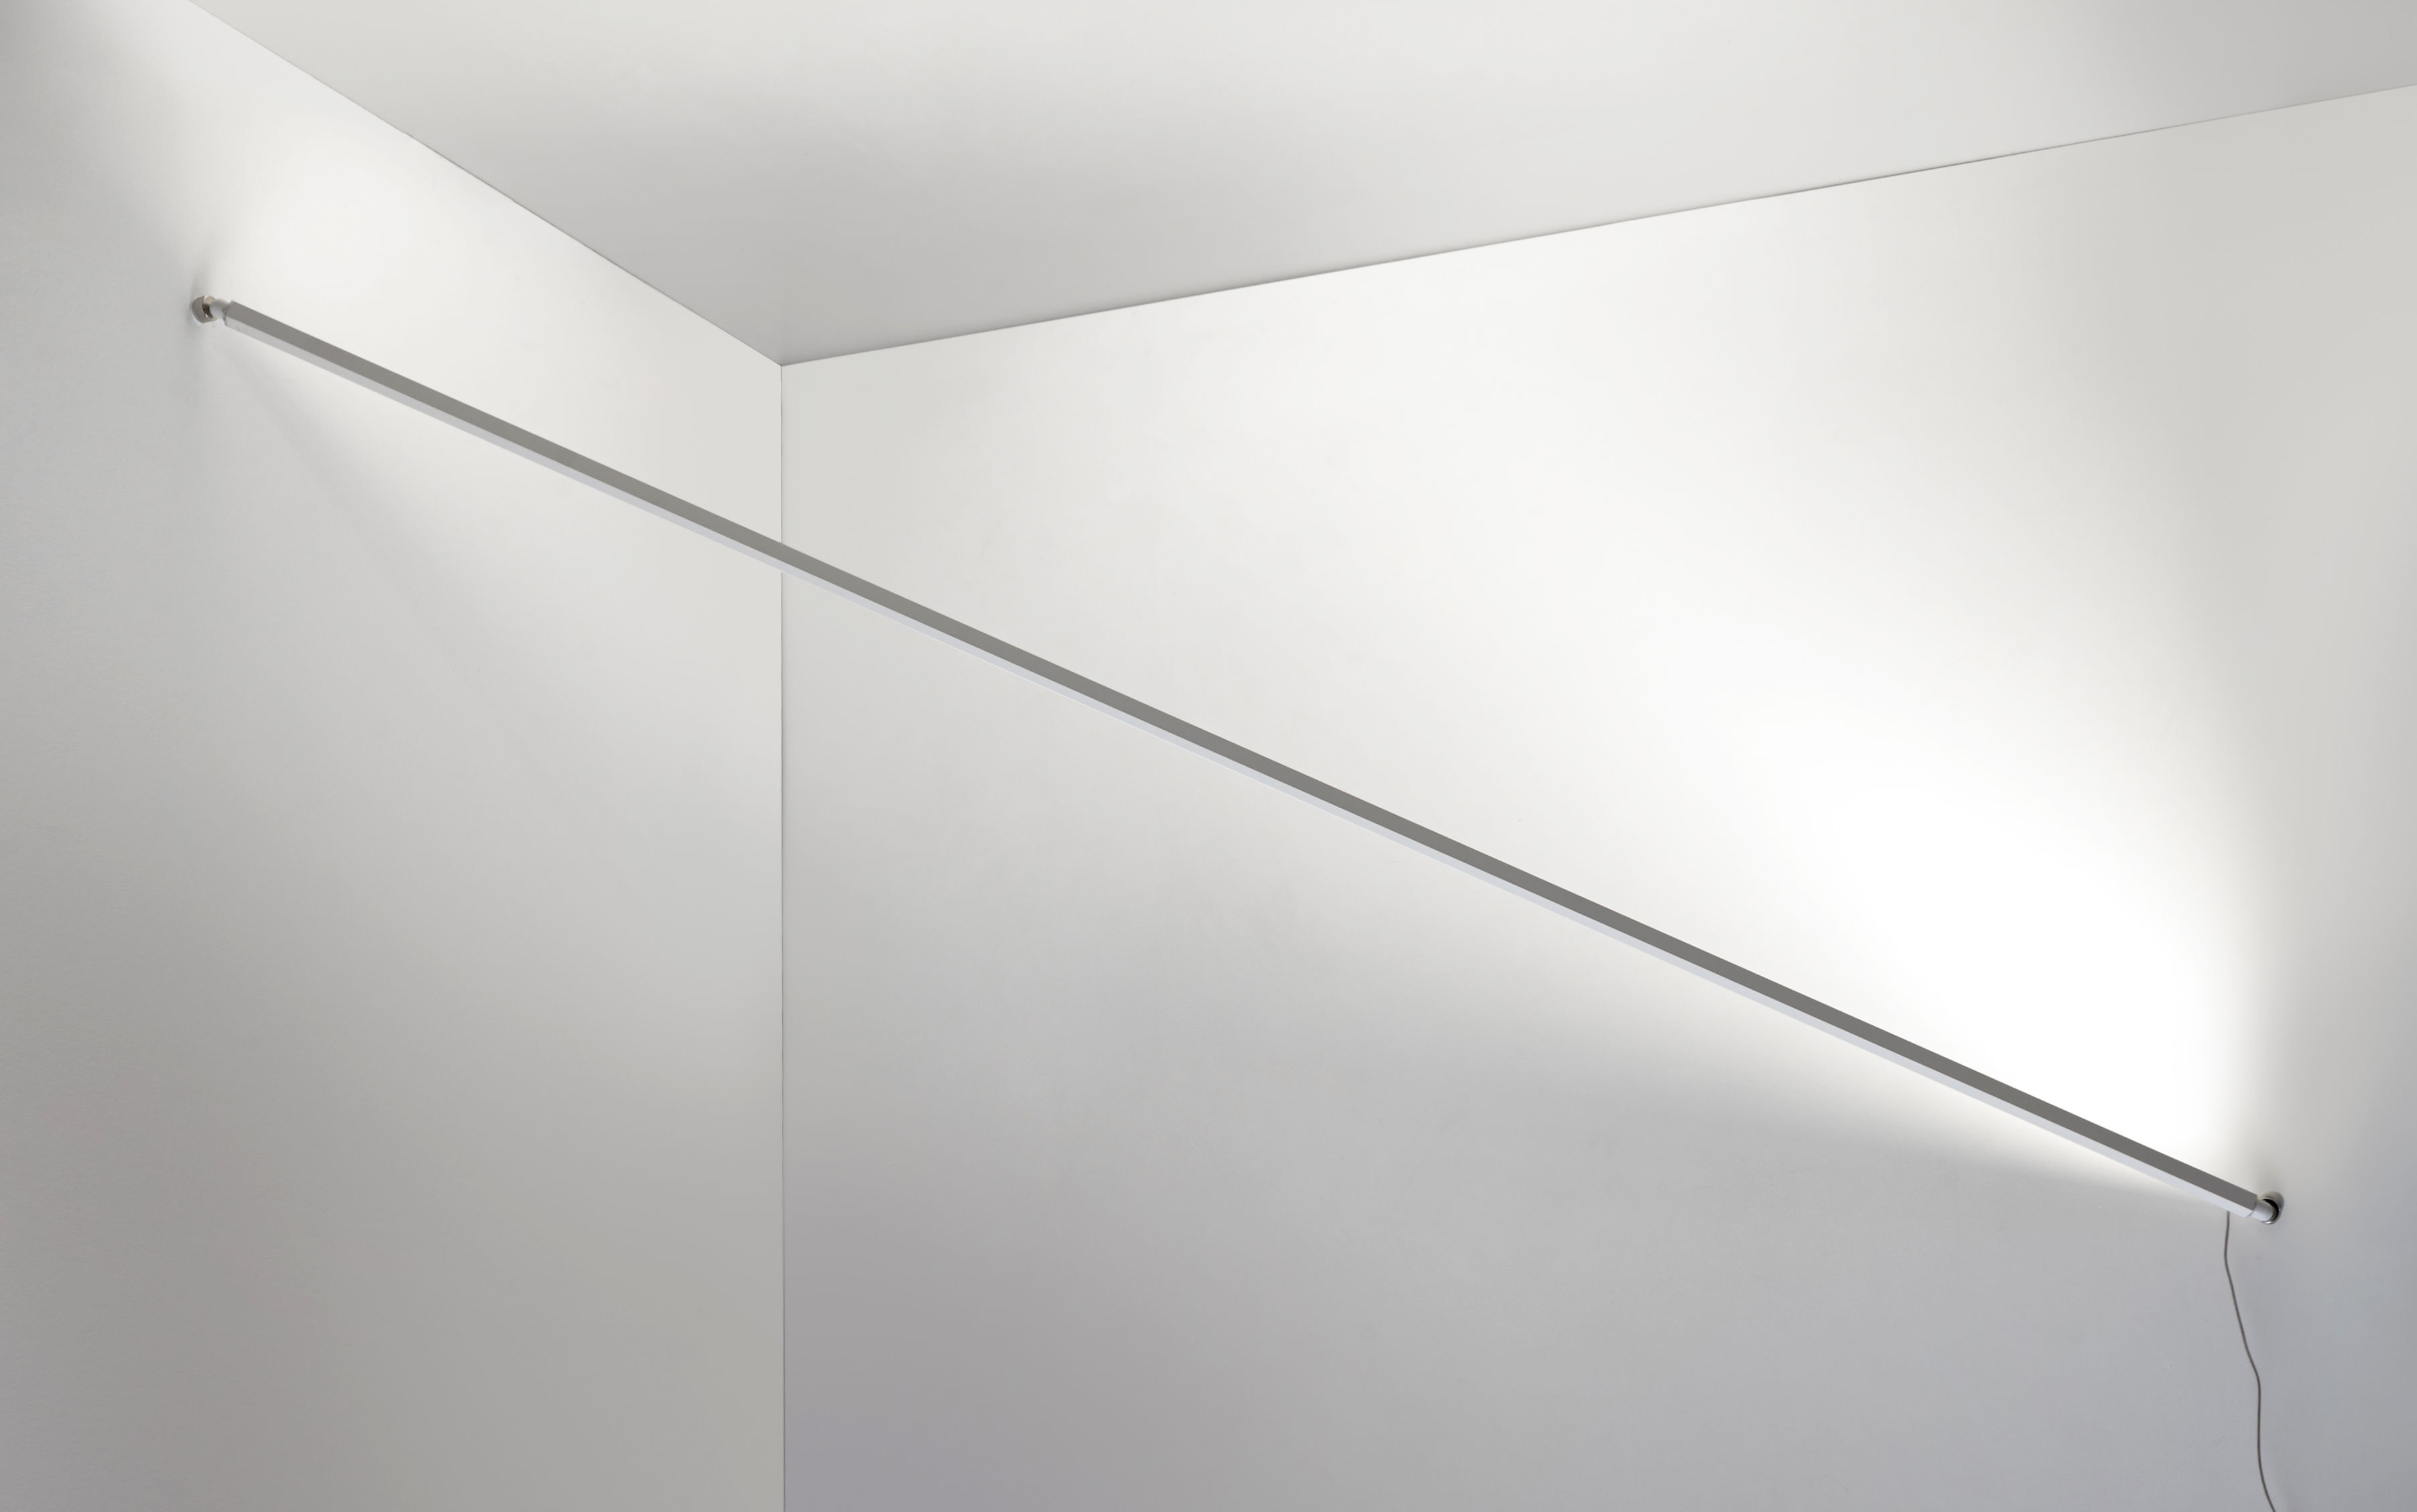 Luminaire - Appliques - Applique Flashit / LED  - L 150 cm - Artemide - Blanc - Acier, Aluminium